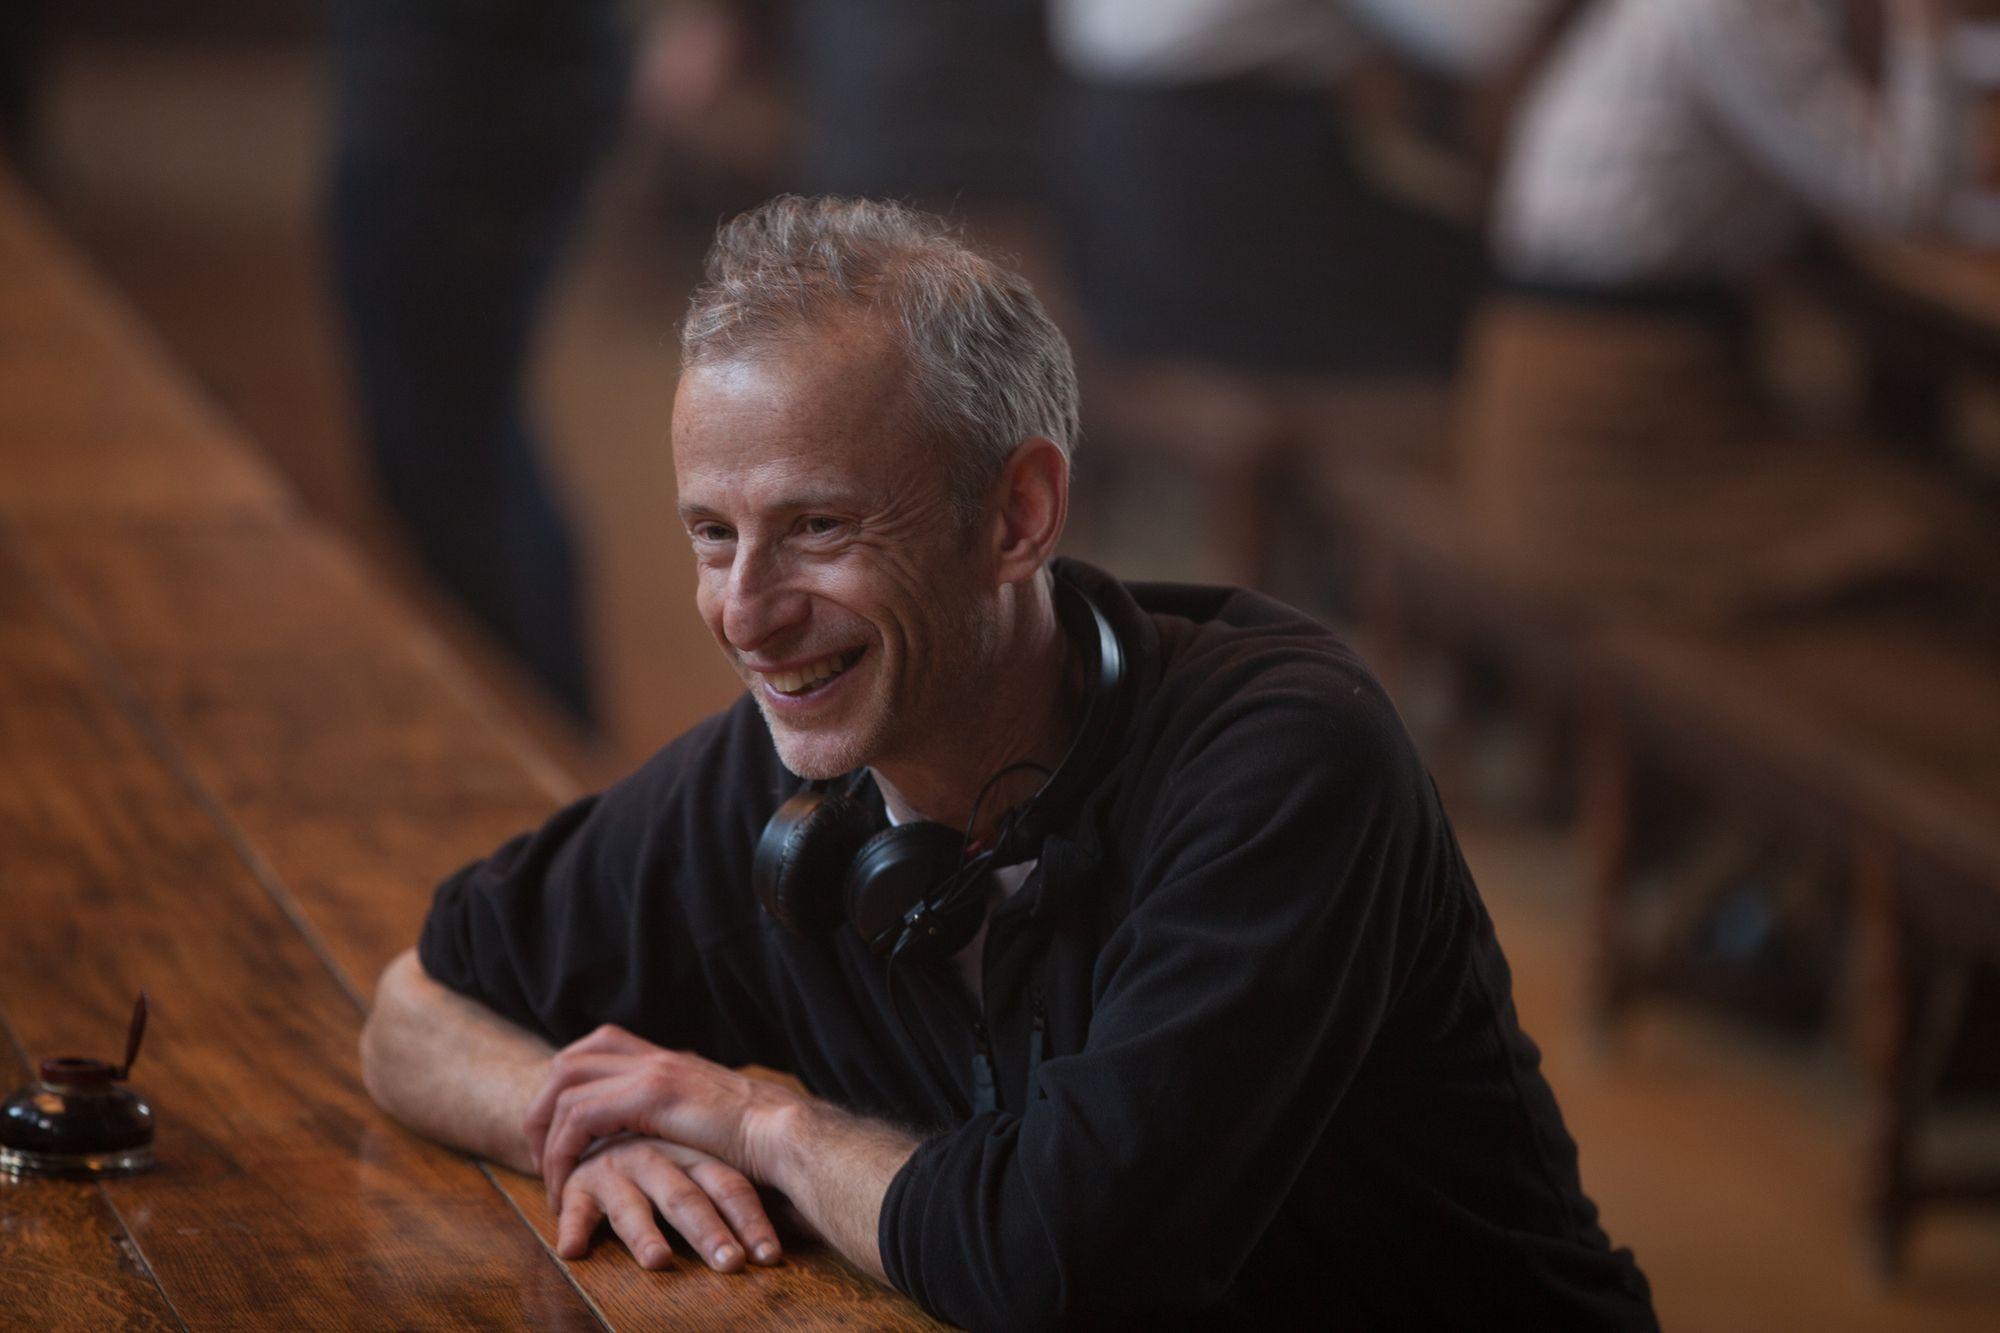 Film Director James Kent on the set Testament of Youth movie backstage images